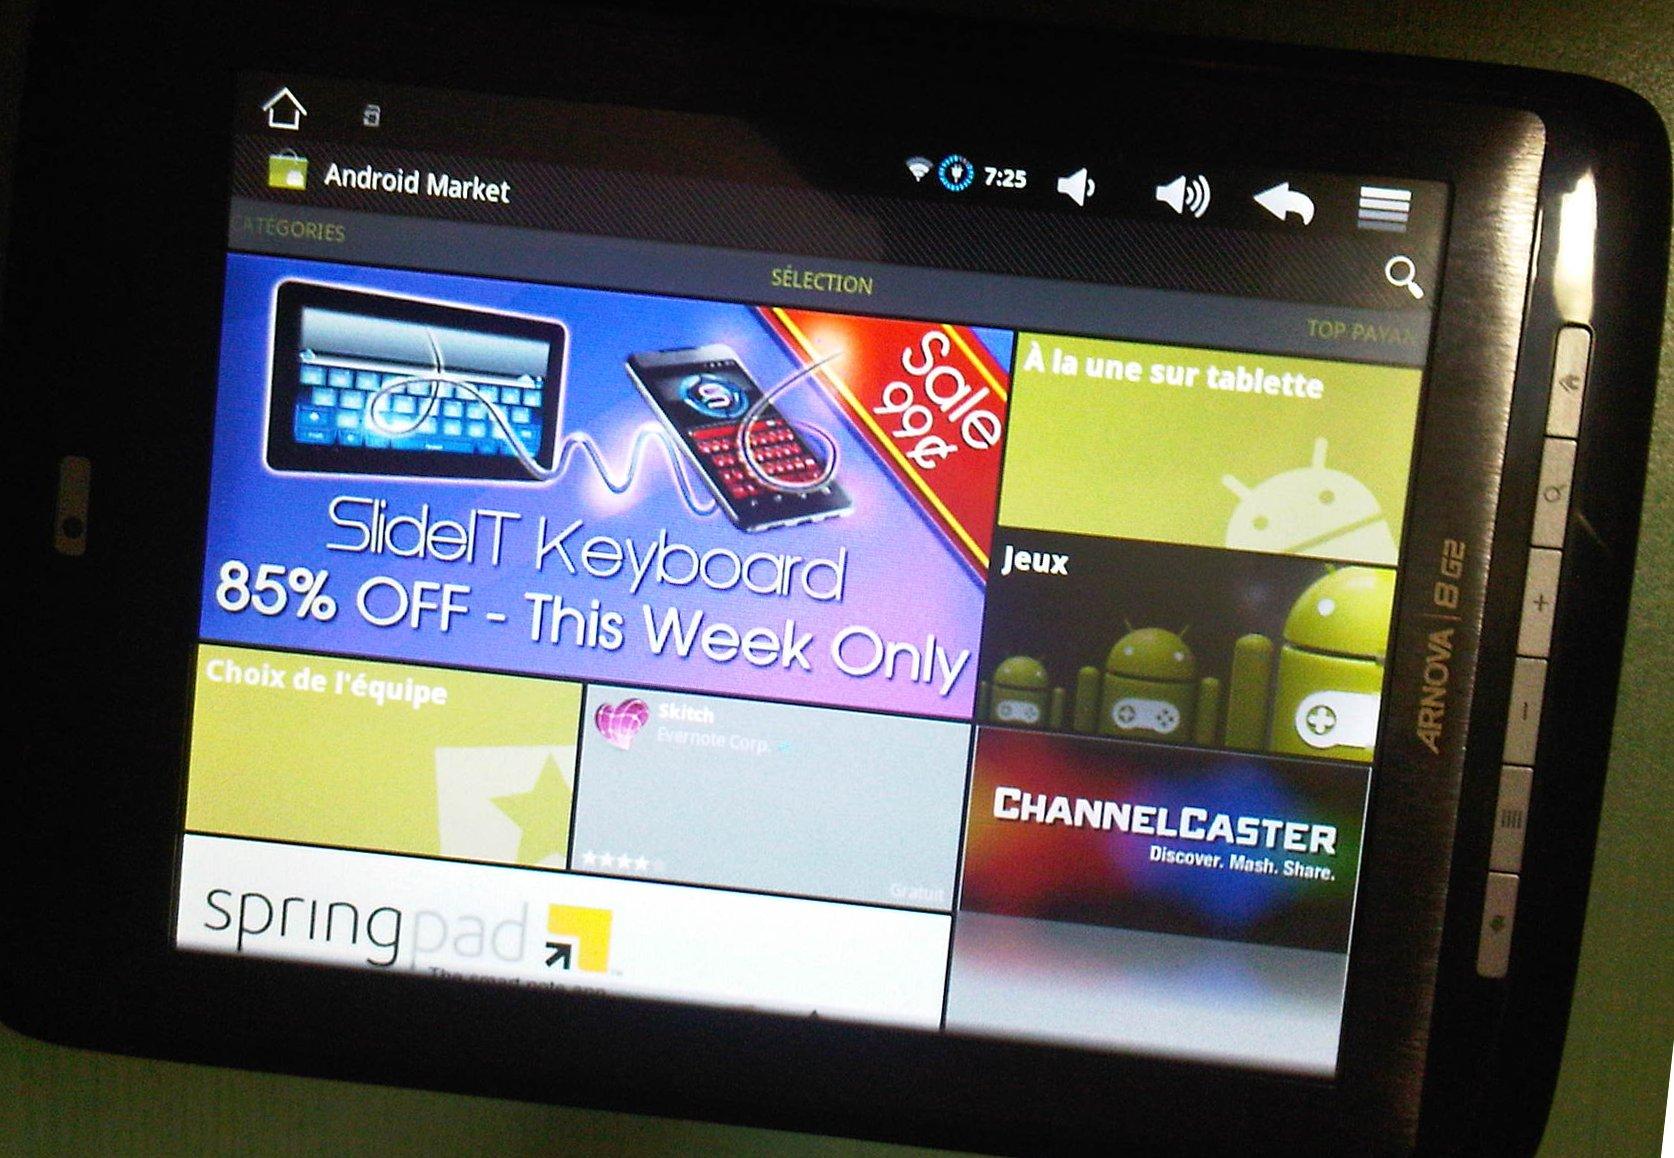 Android maket sur Arnova 8G2